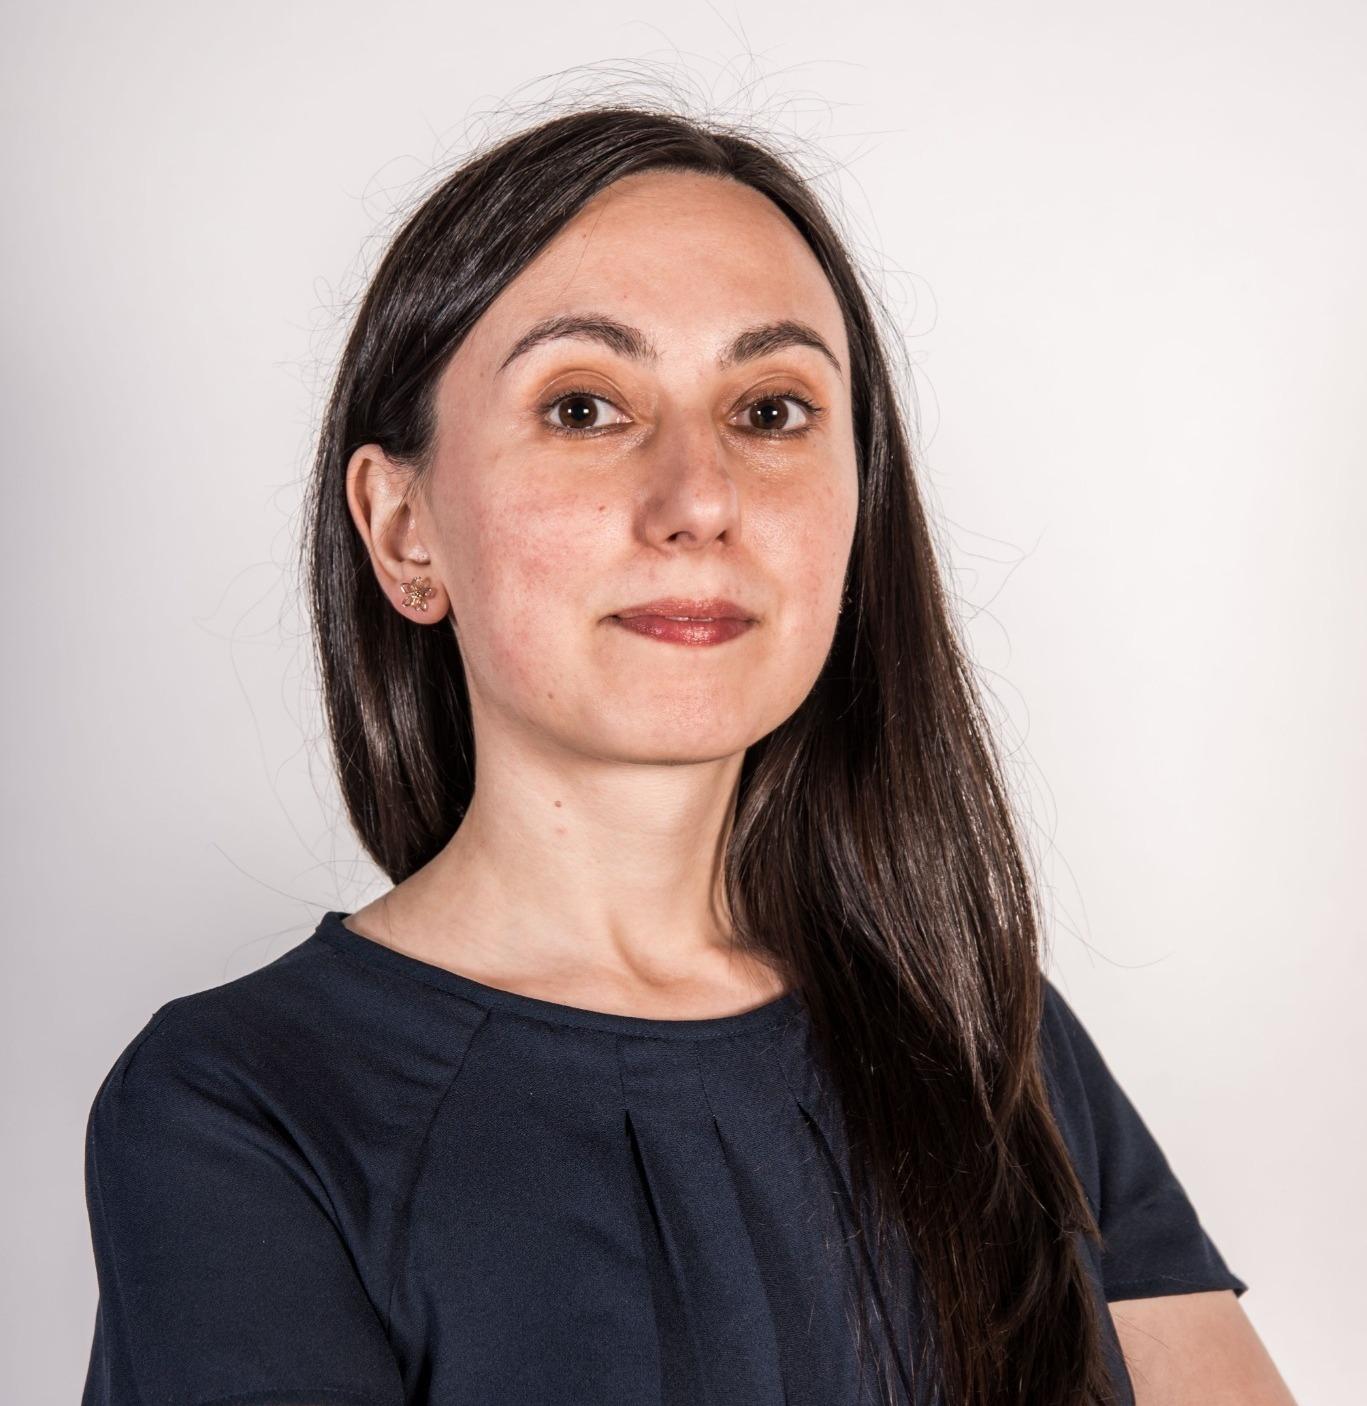 Ani Kodjabasheva portrait photo